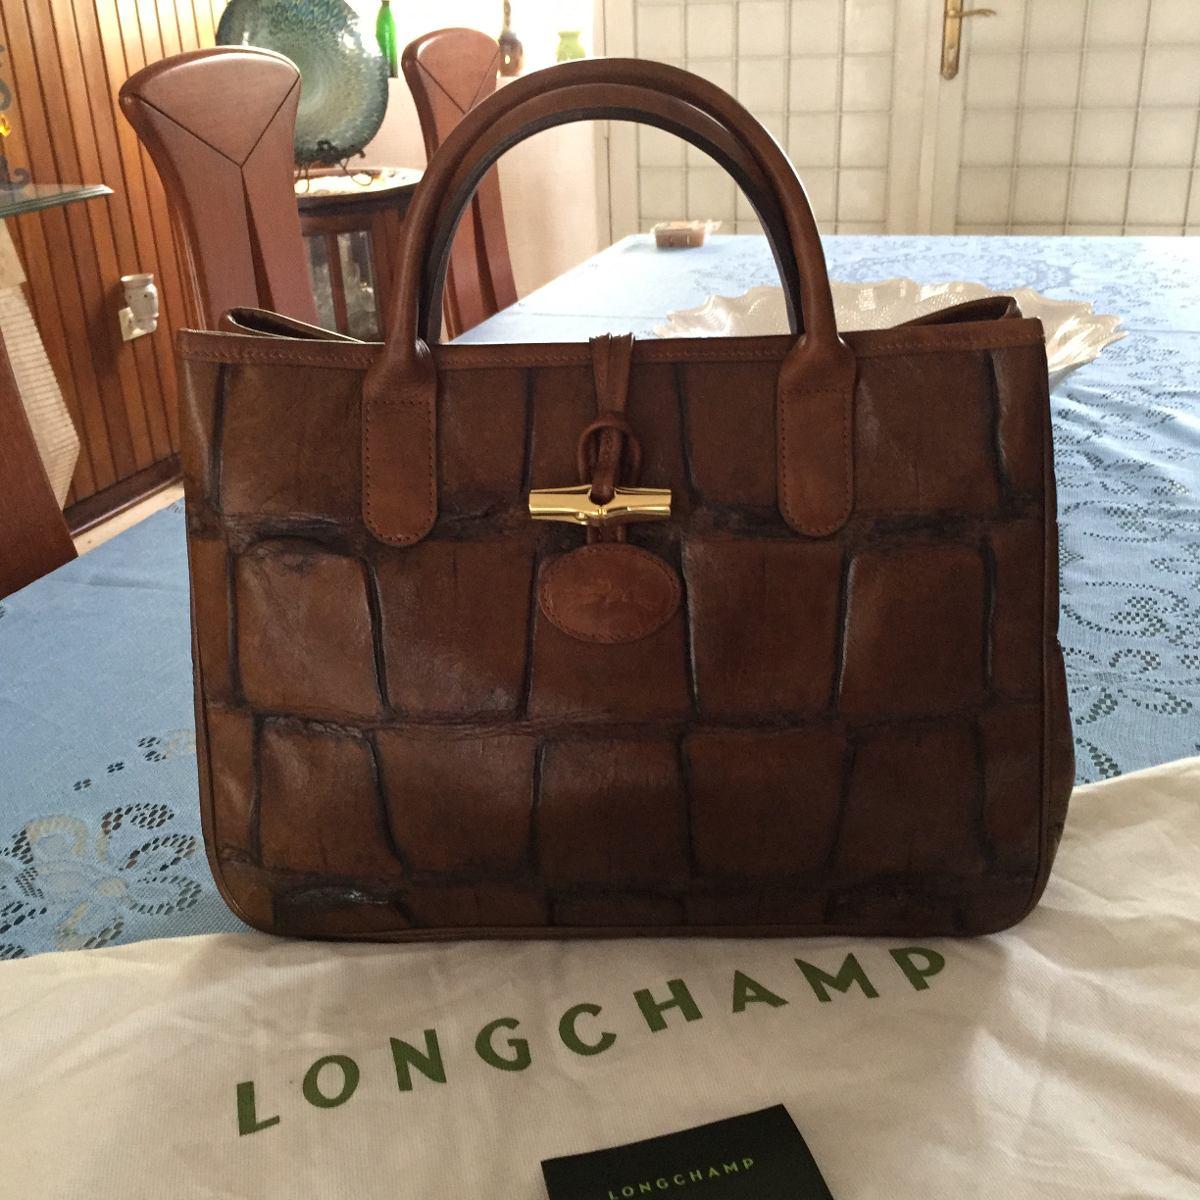 comprar online d079c 823ae Cartera Longchamp Original Piel Cocodrilo 34 Cm